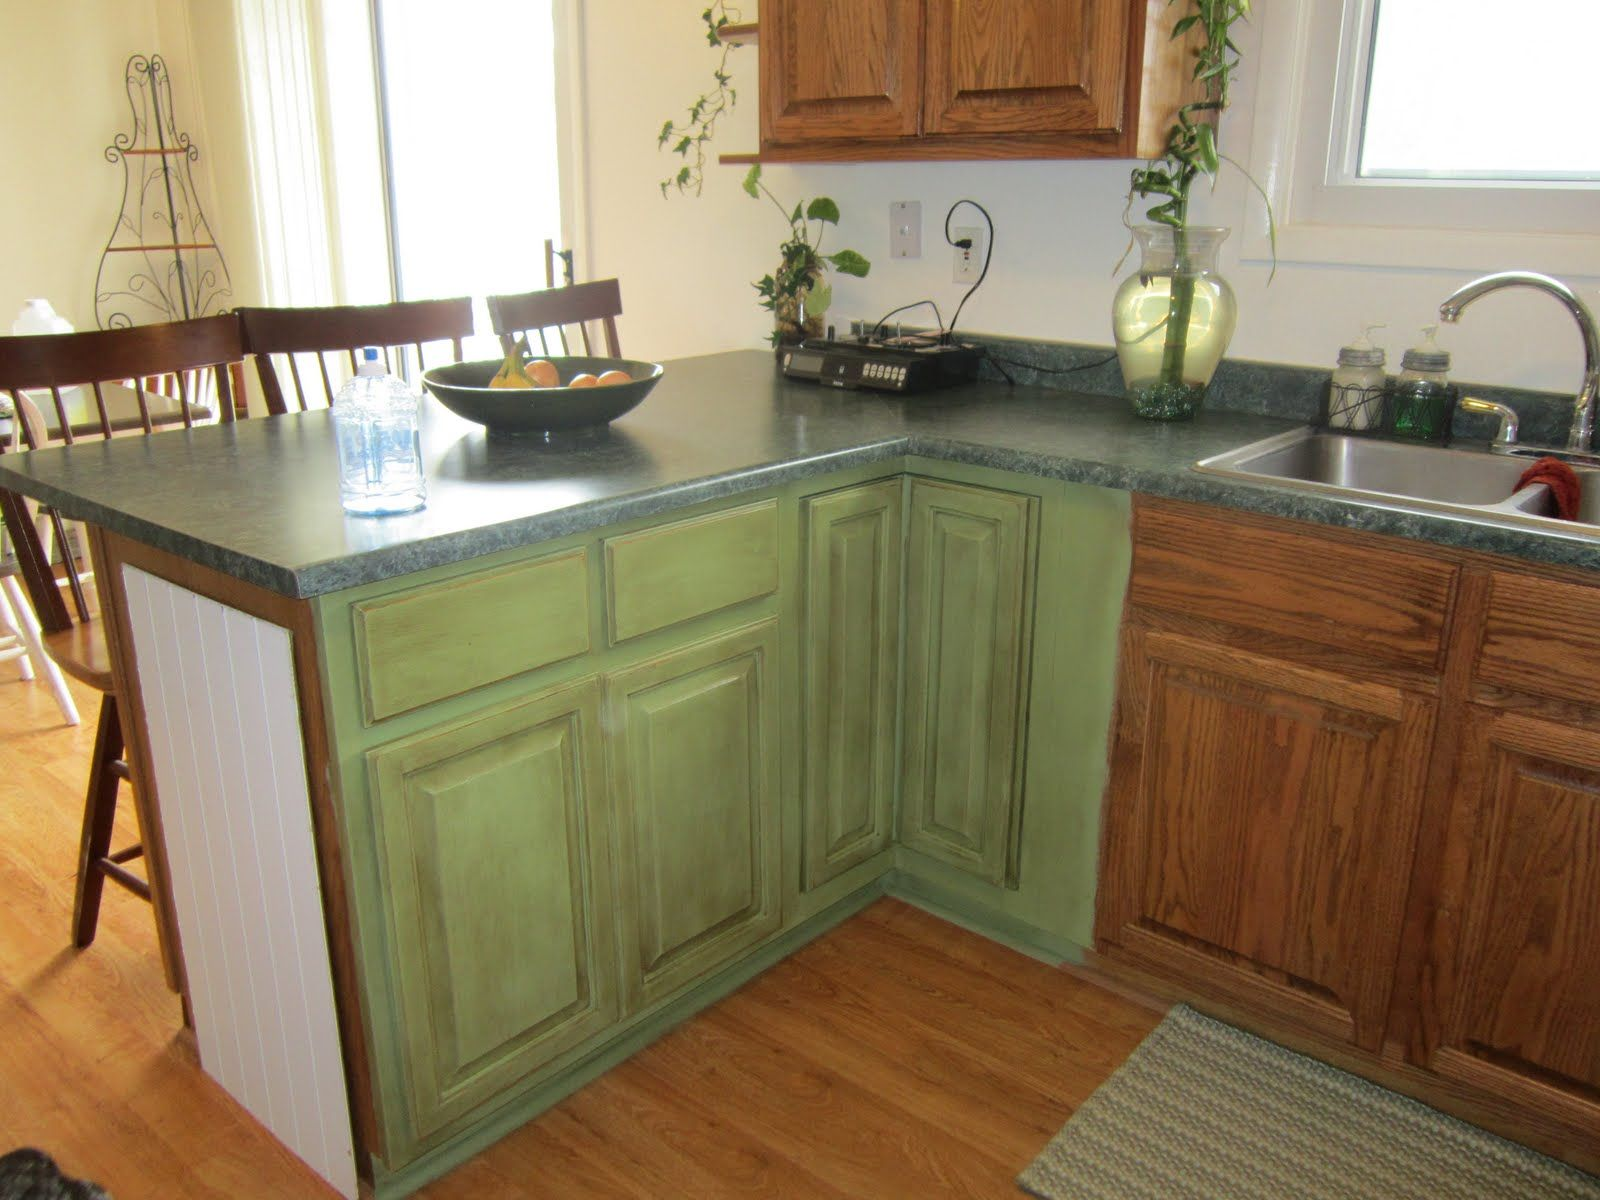 Painting Kitchen Cabinets Ideas Kitchen Paint Schemes Cheap - Chalk paint kitchen cabinets